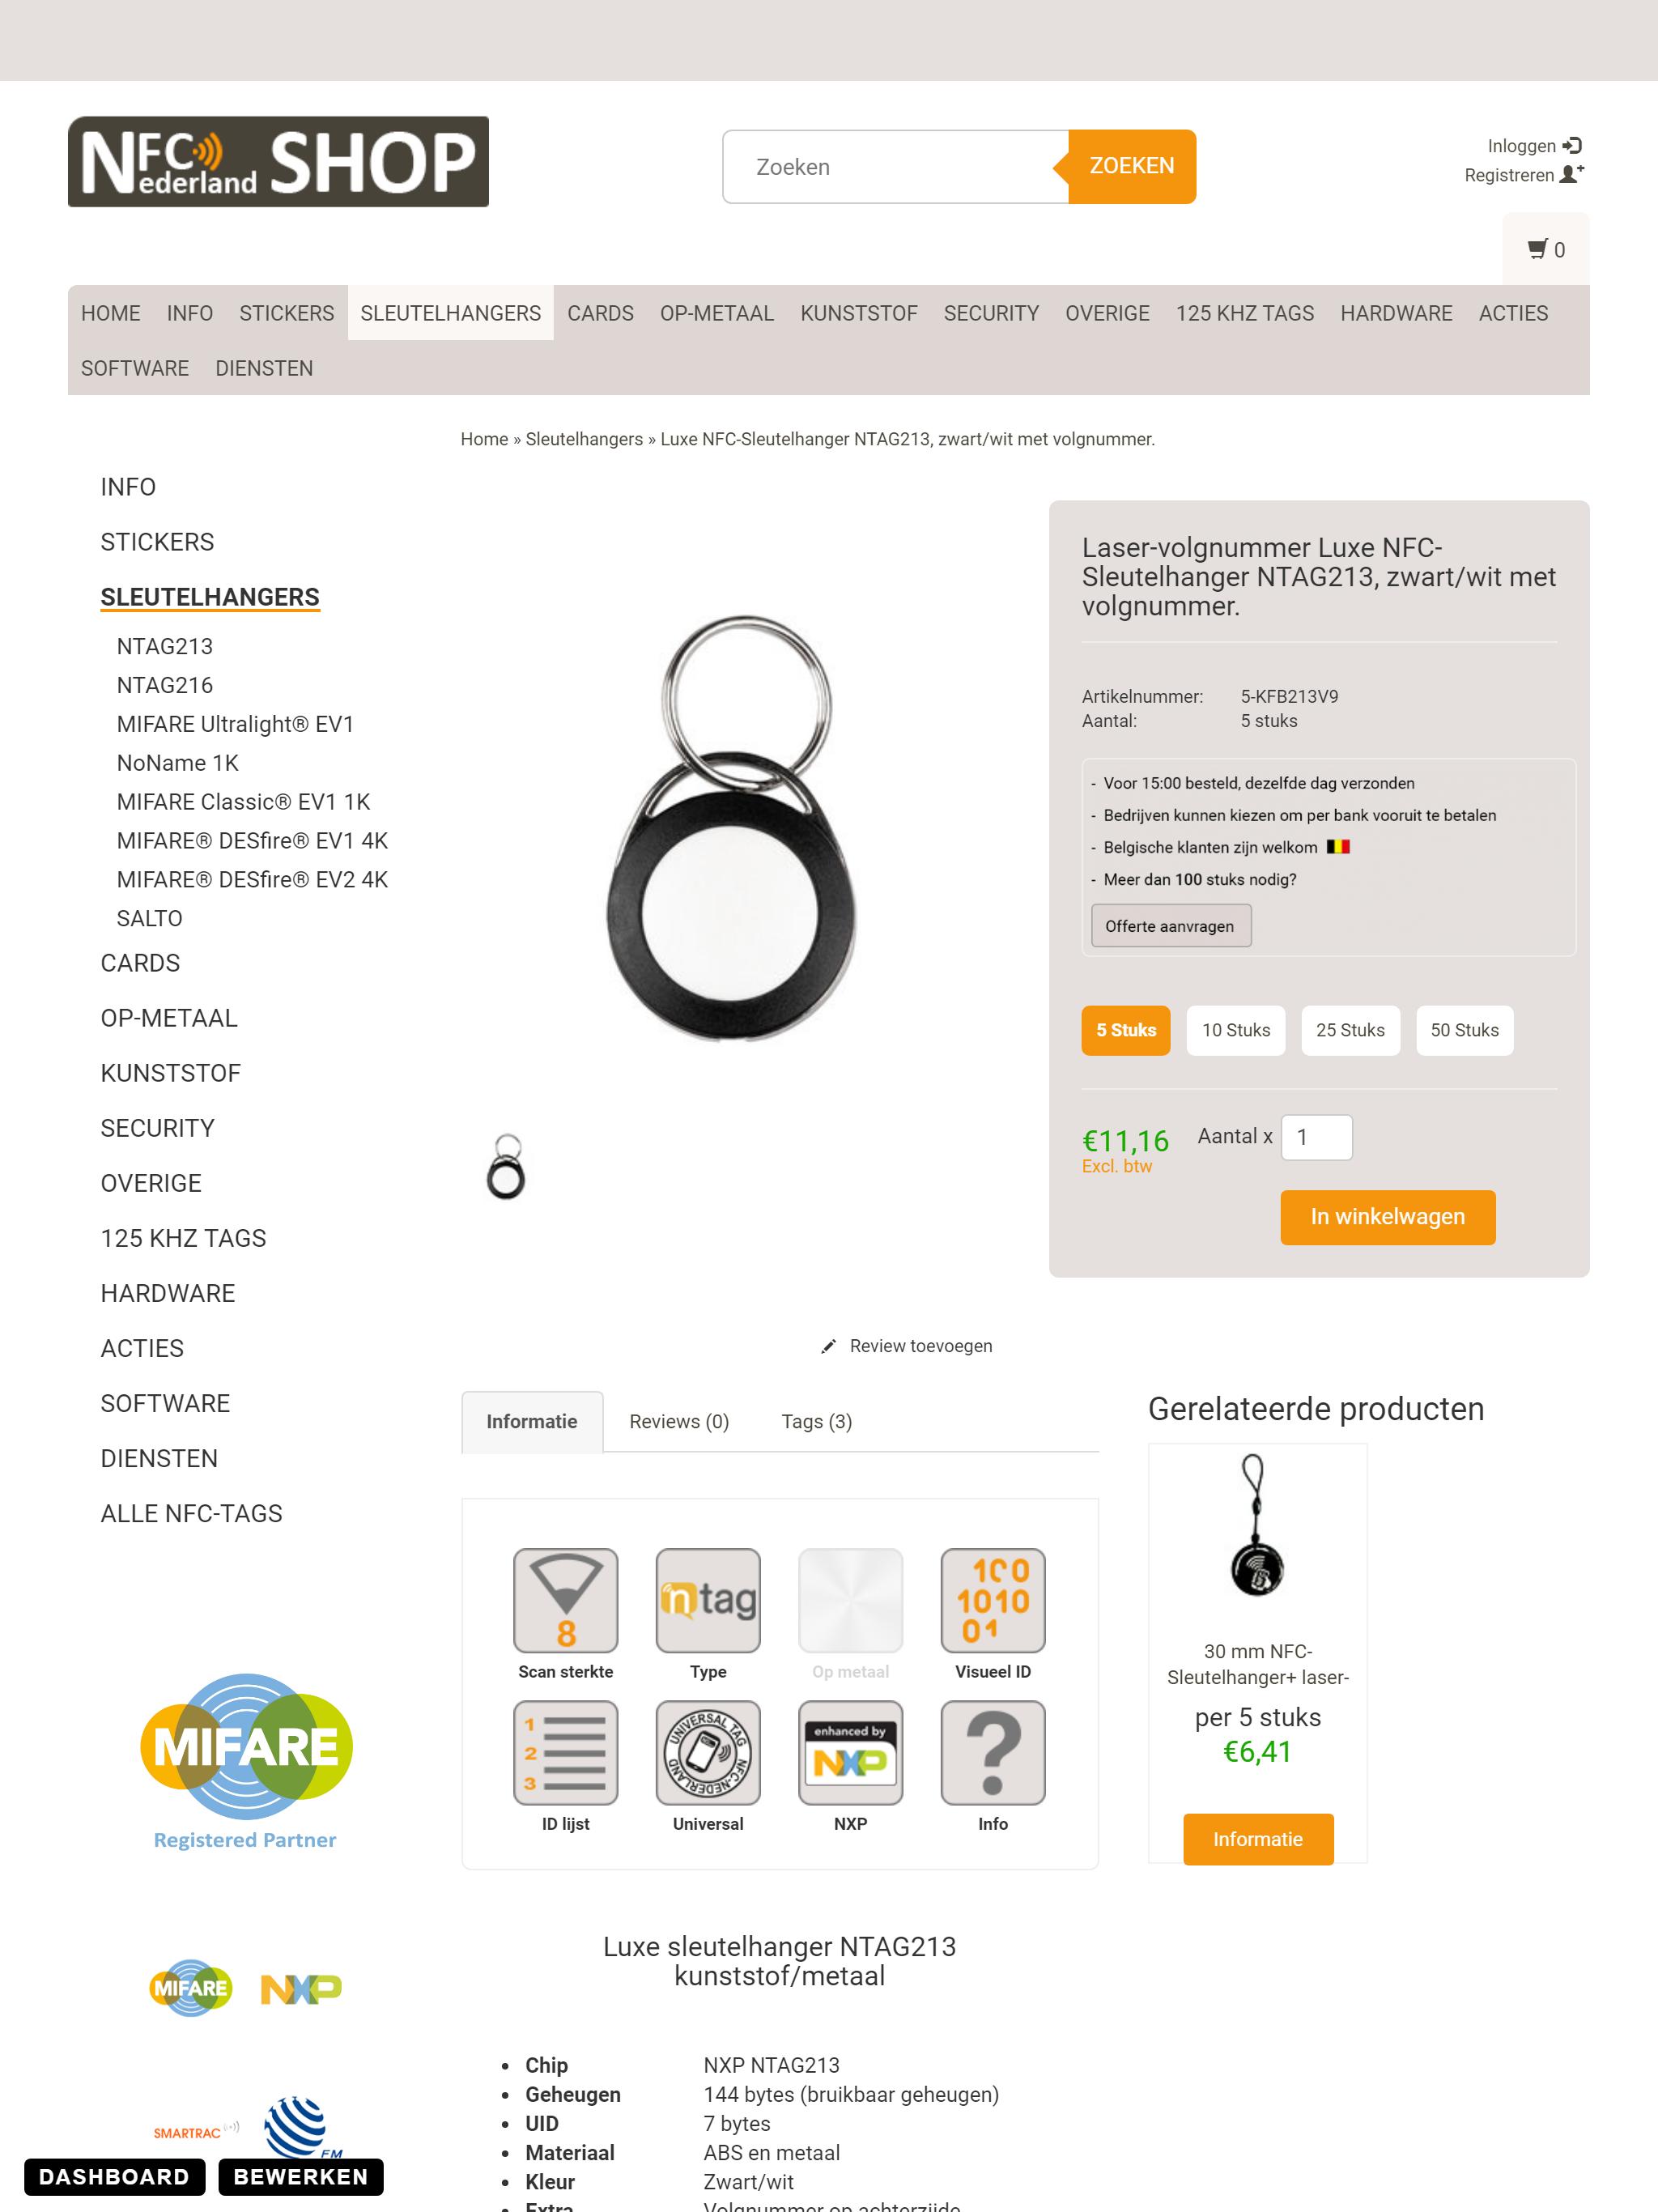 www.nfc-nederland-shop.nl_luxe-nfc-sleutelhanger-ntag213-zwart-wit-numm.html(iPad Pro)